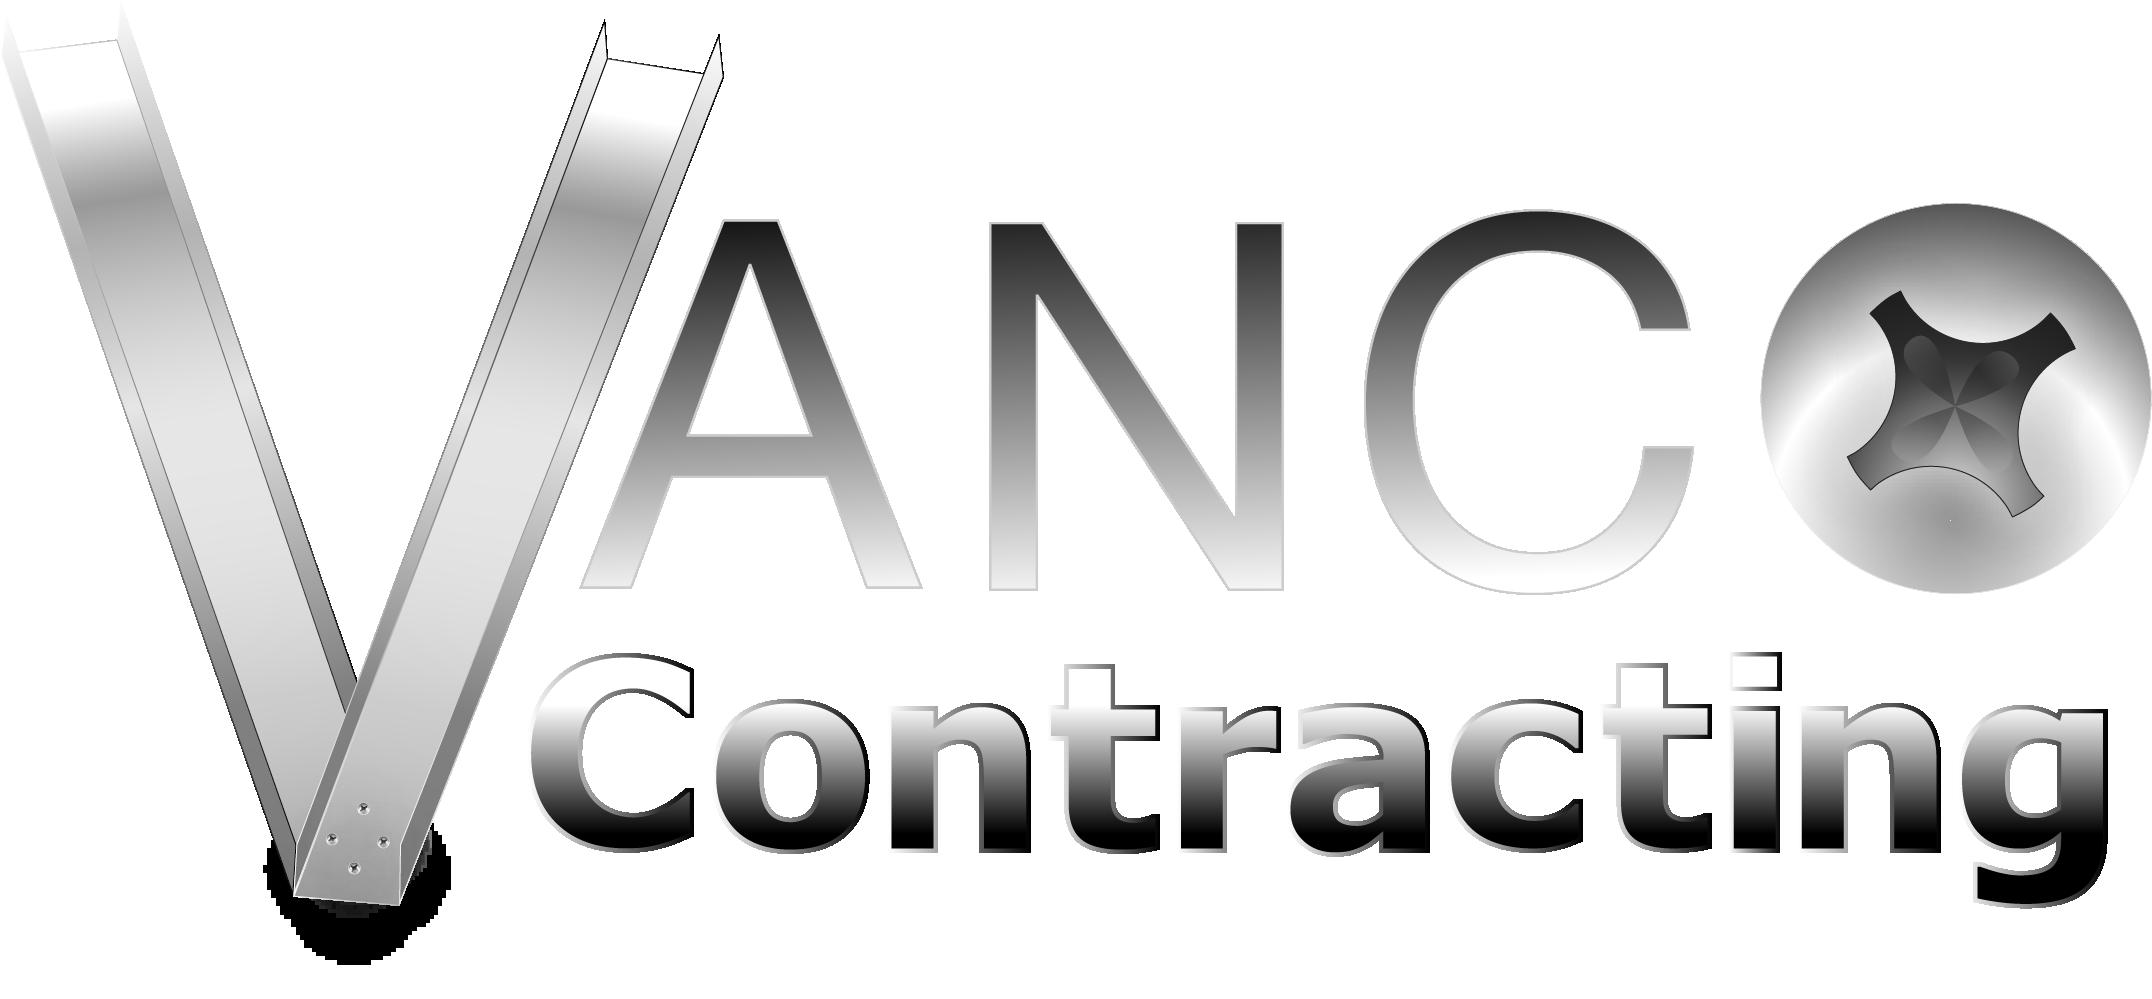 Vanco Contracting